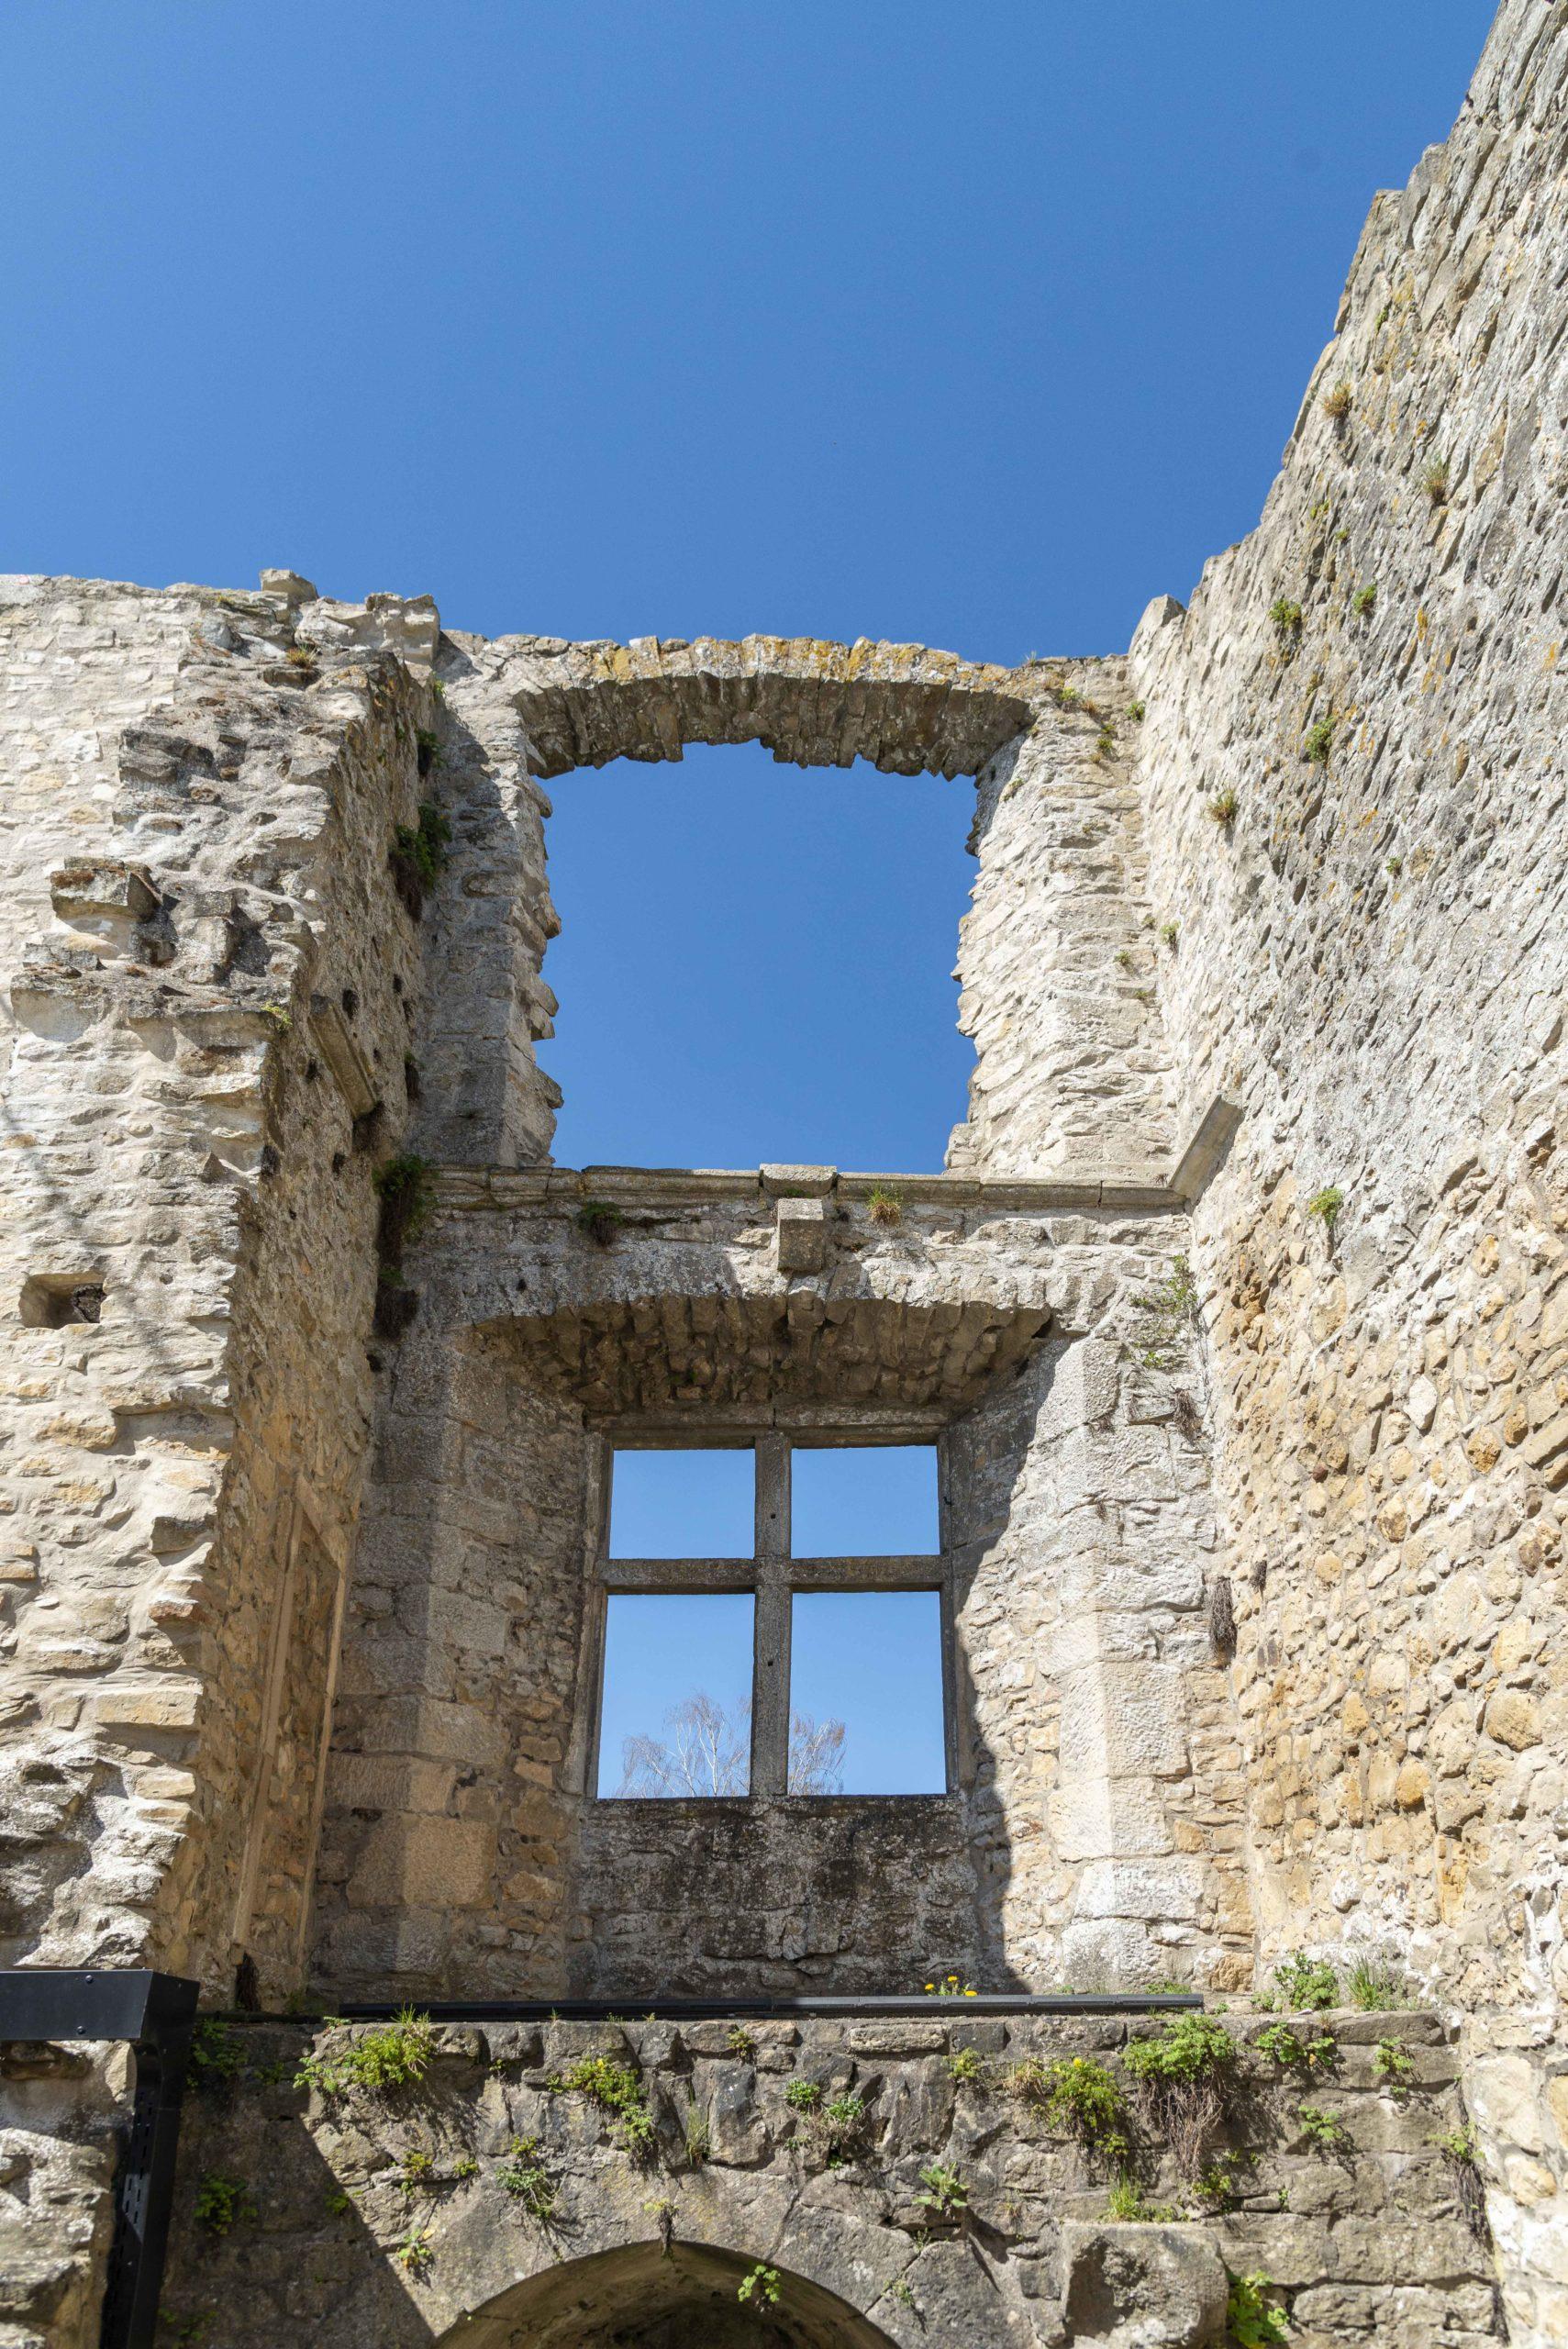 Burgruine in Koerich